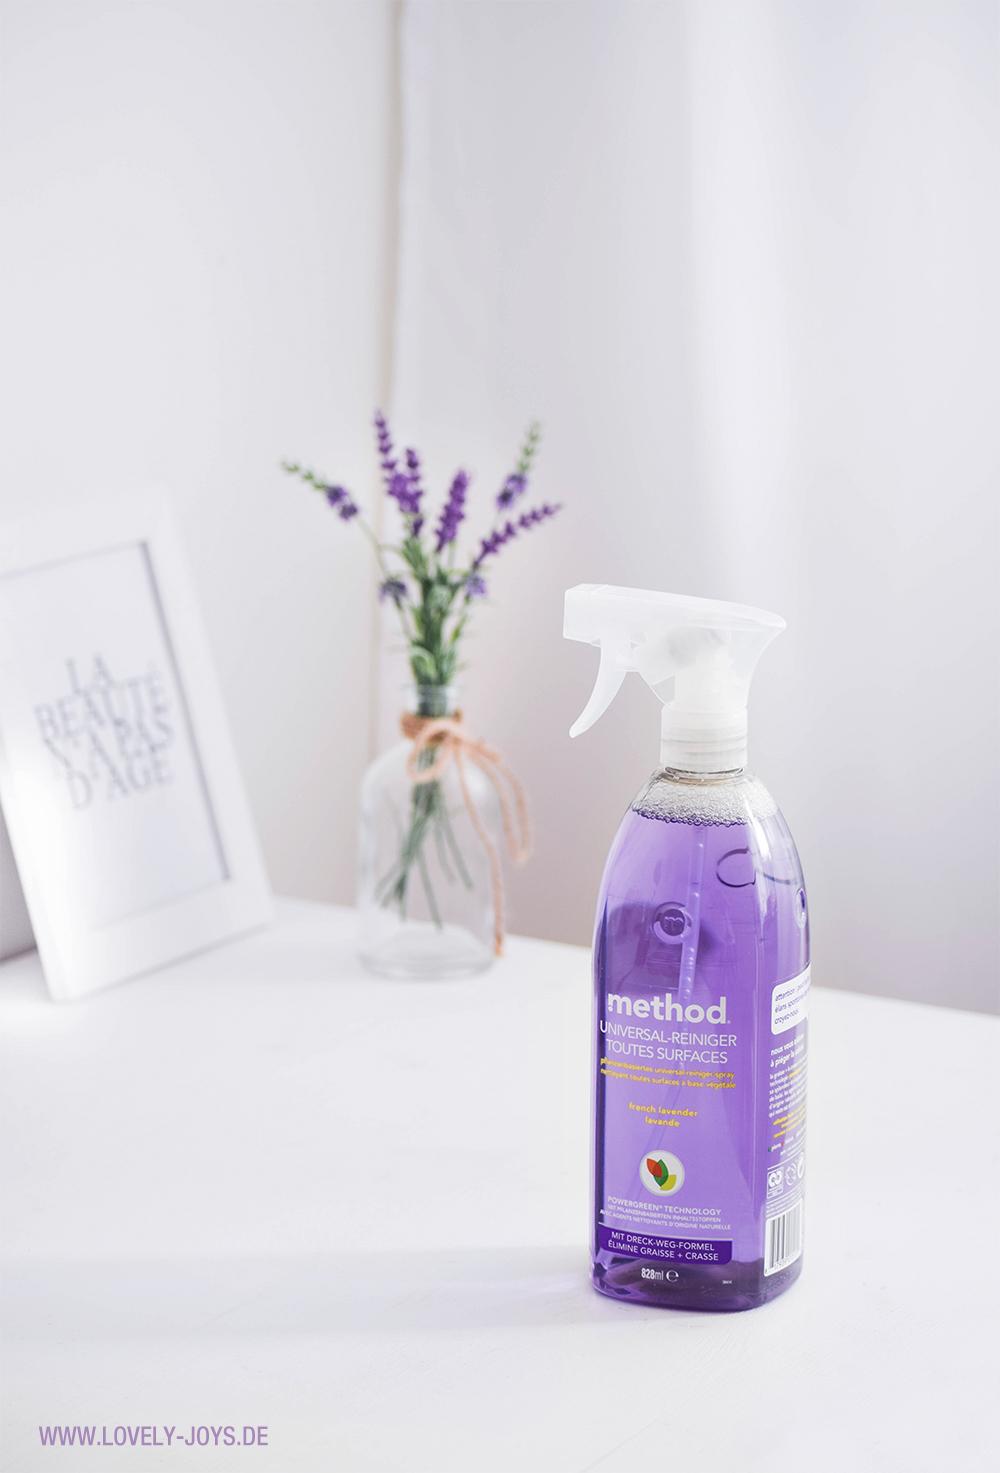 Method Vegan Universal Reiniger Lila gesund ohne Chemie Lavendel